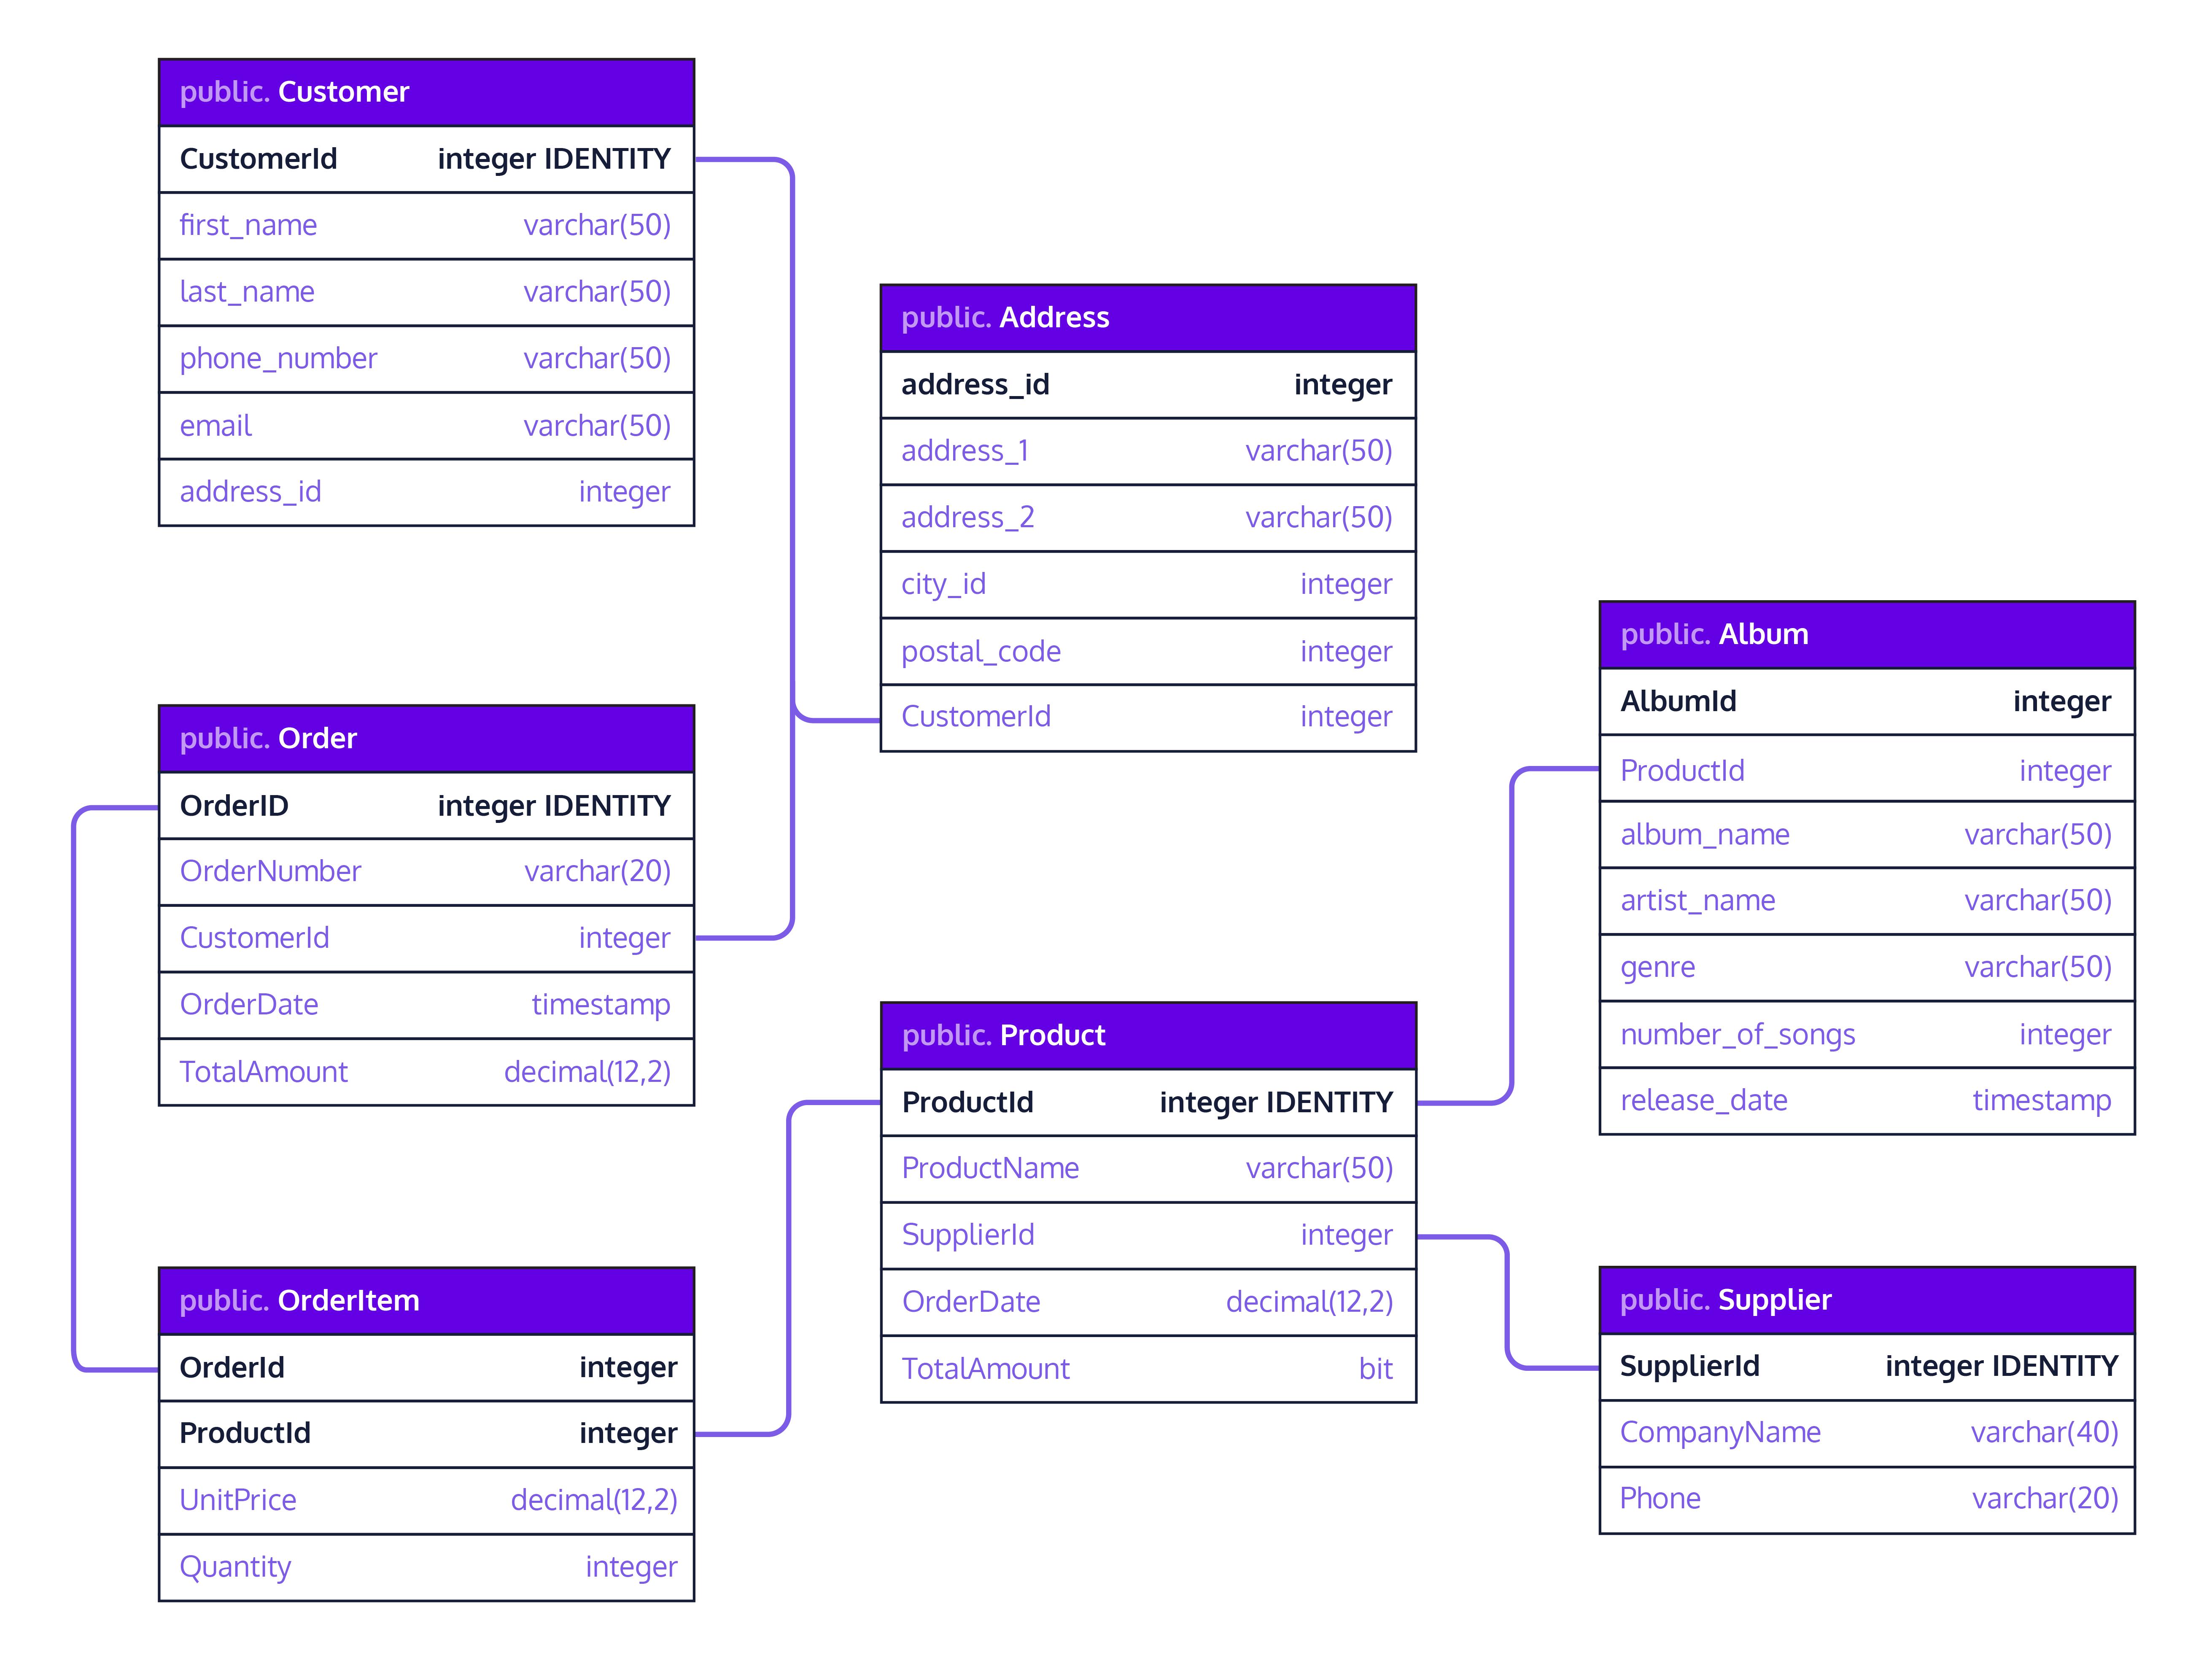 An Entity Relationship Diagram